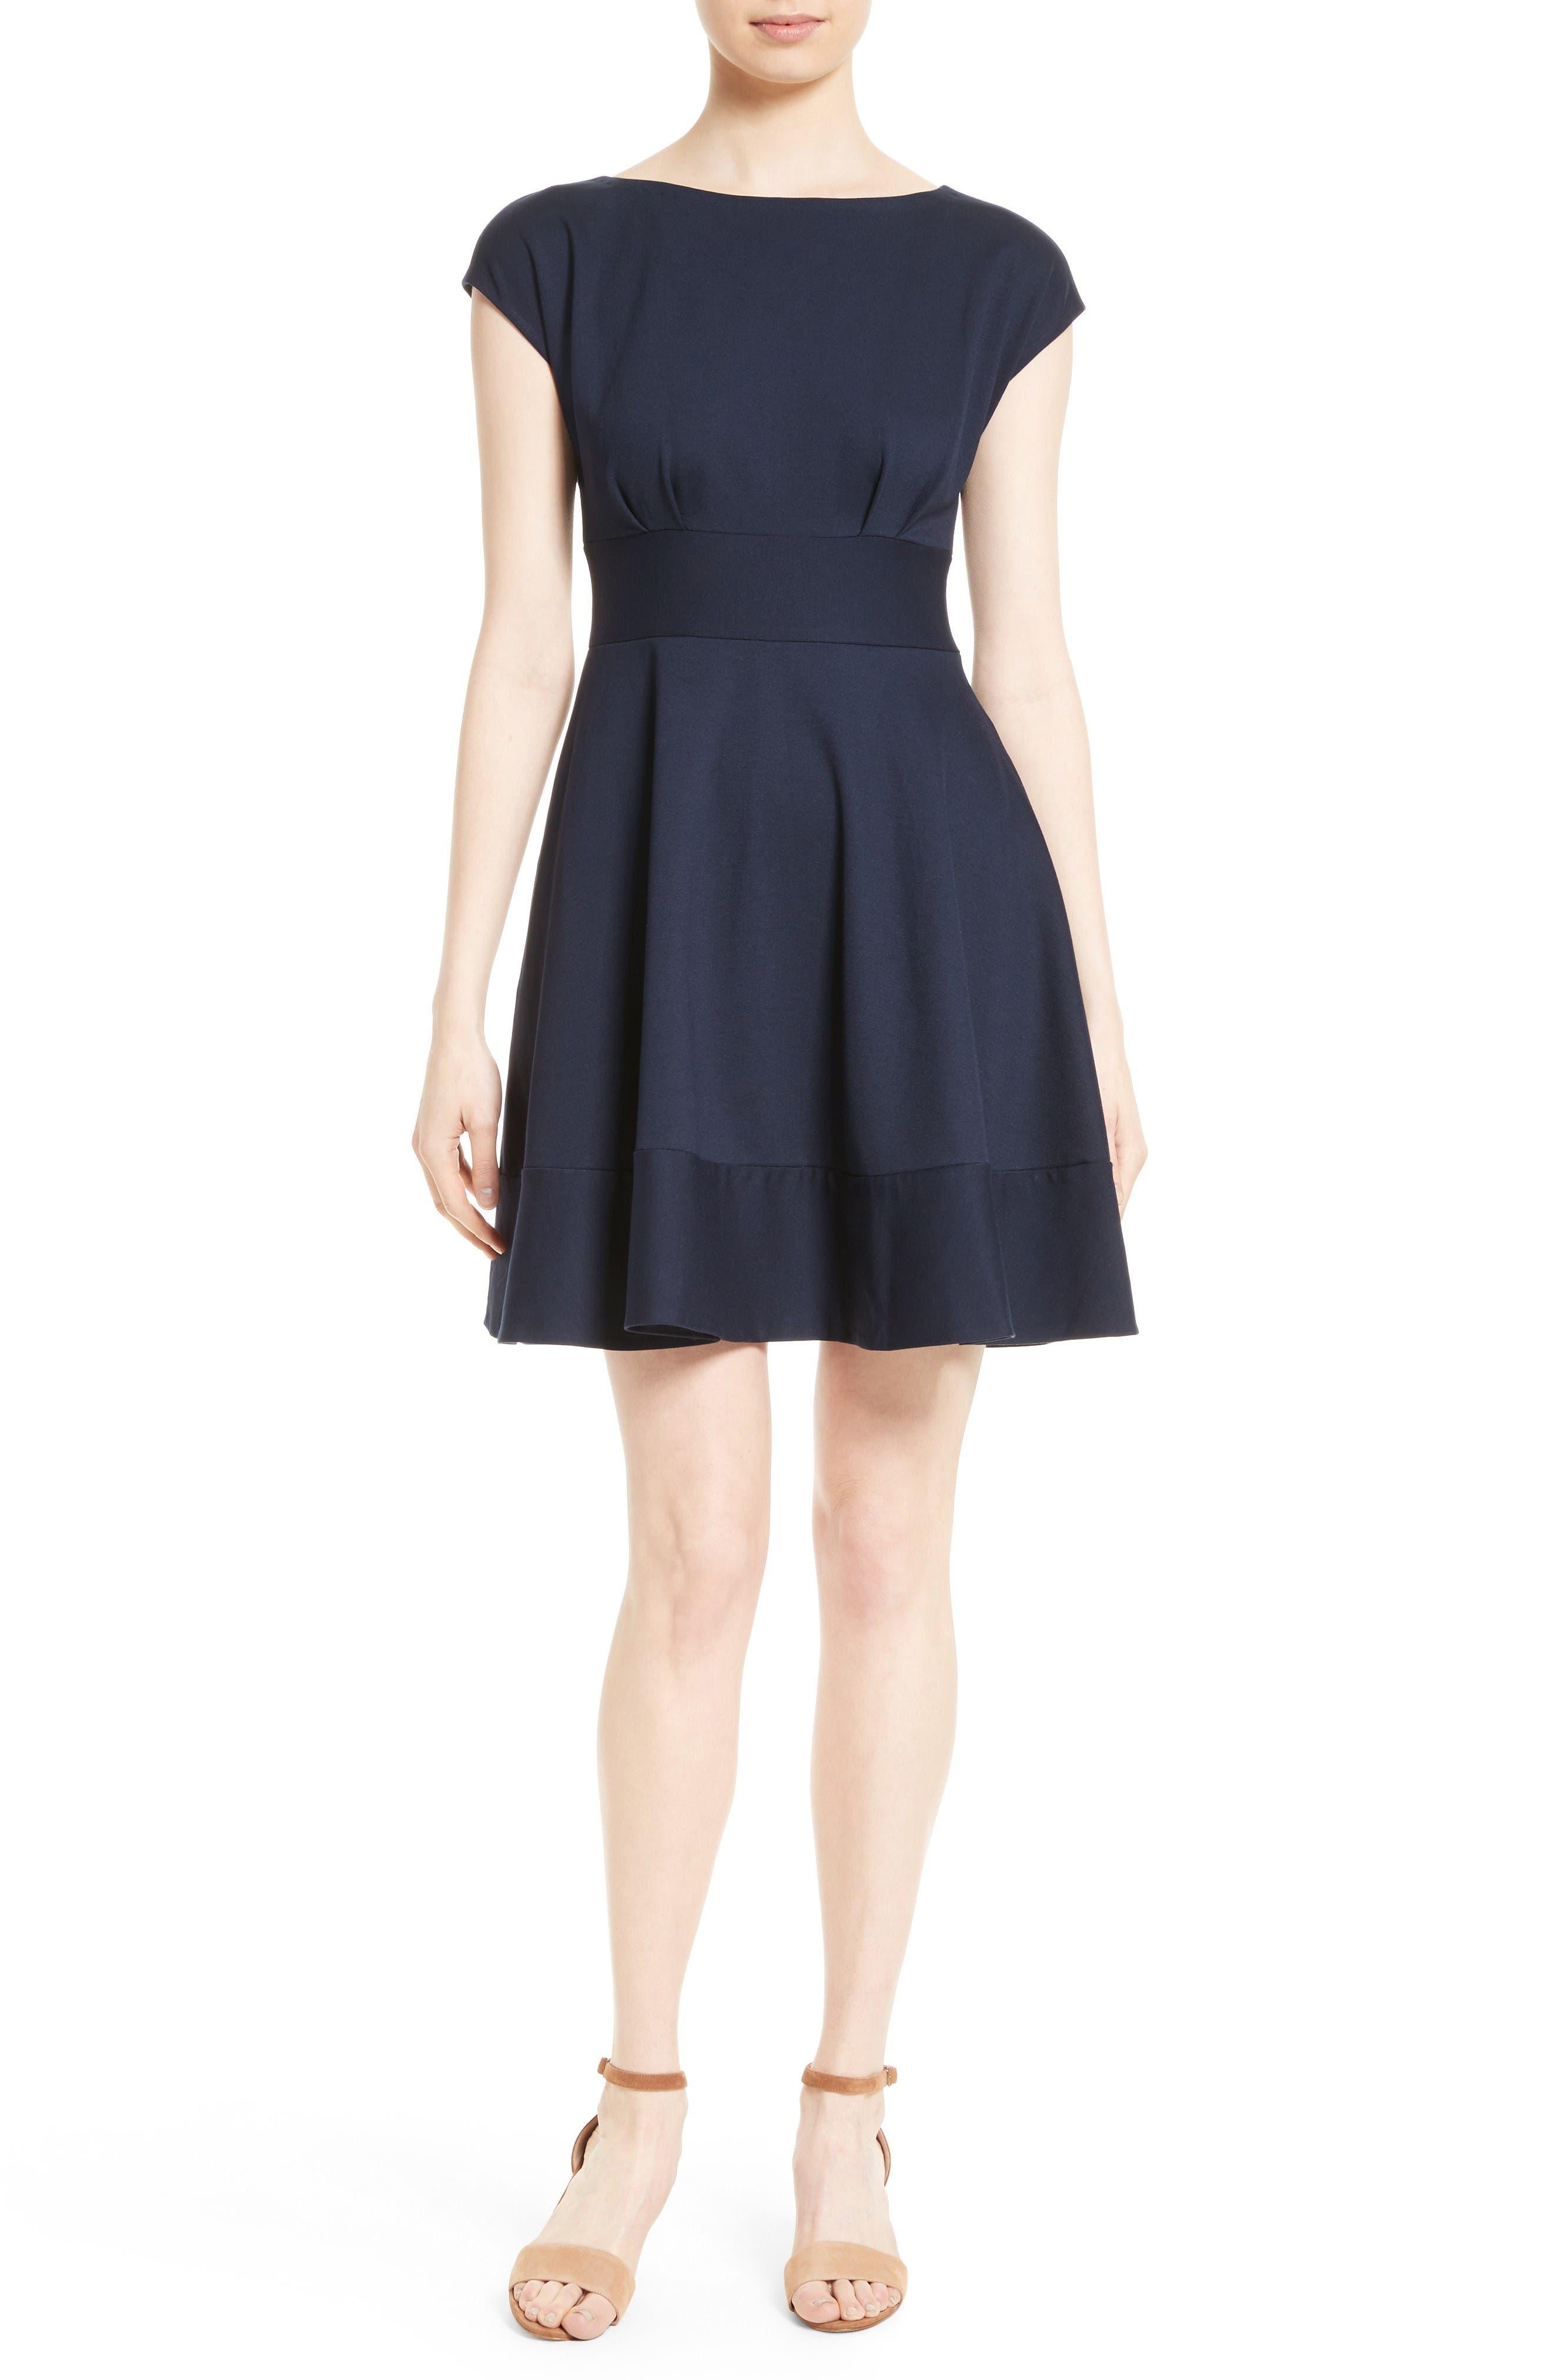 Alternate Image 1 Selected - kate spade new york ponte fiorella fit & flare dress